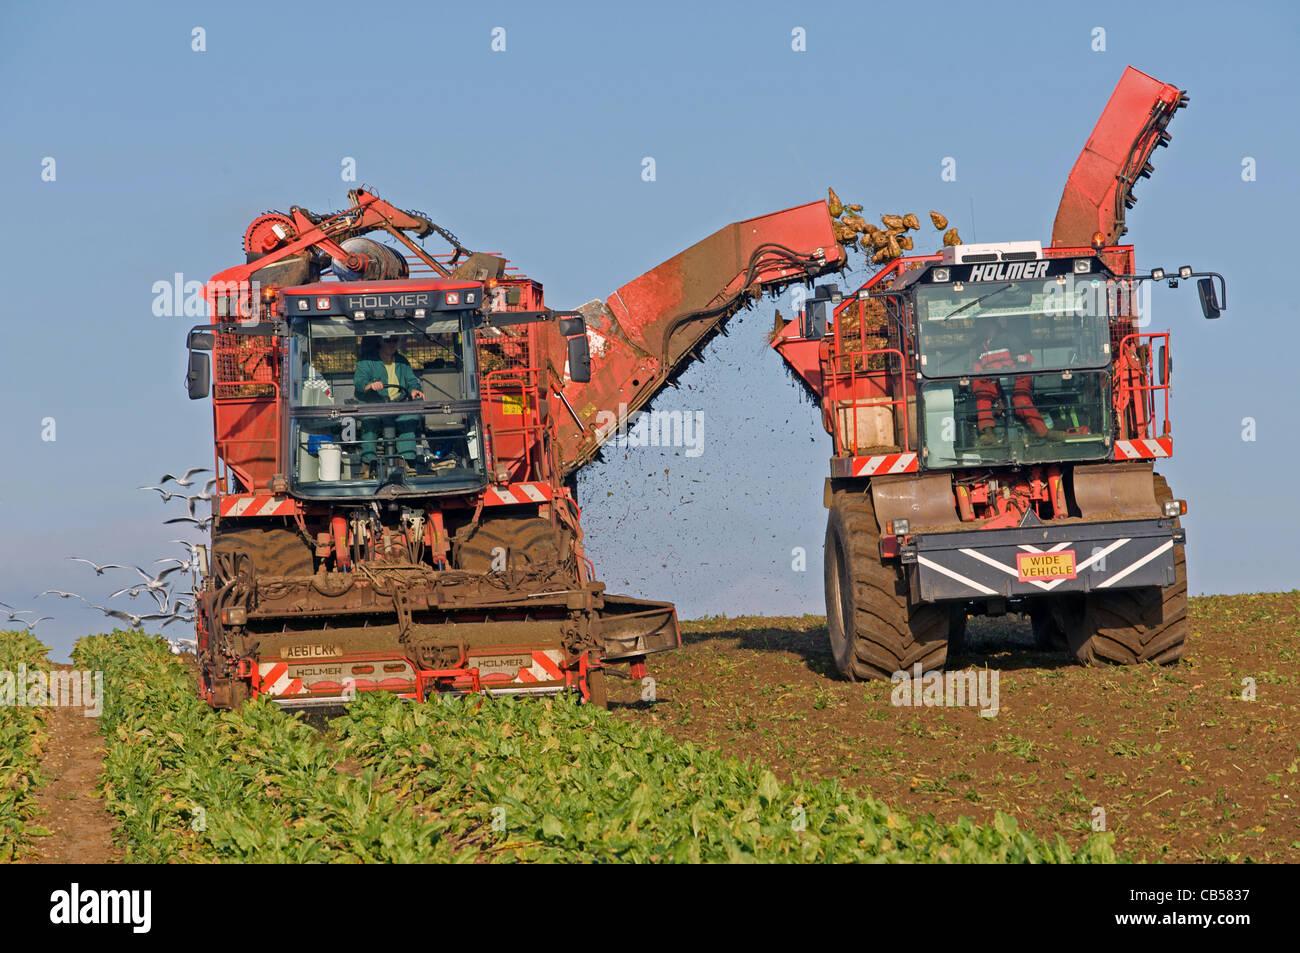 Holmer self-propelled sugar beet harvesters - Stock Image